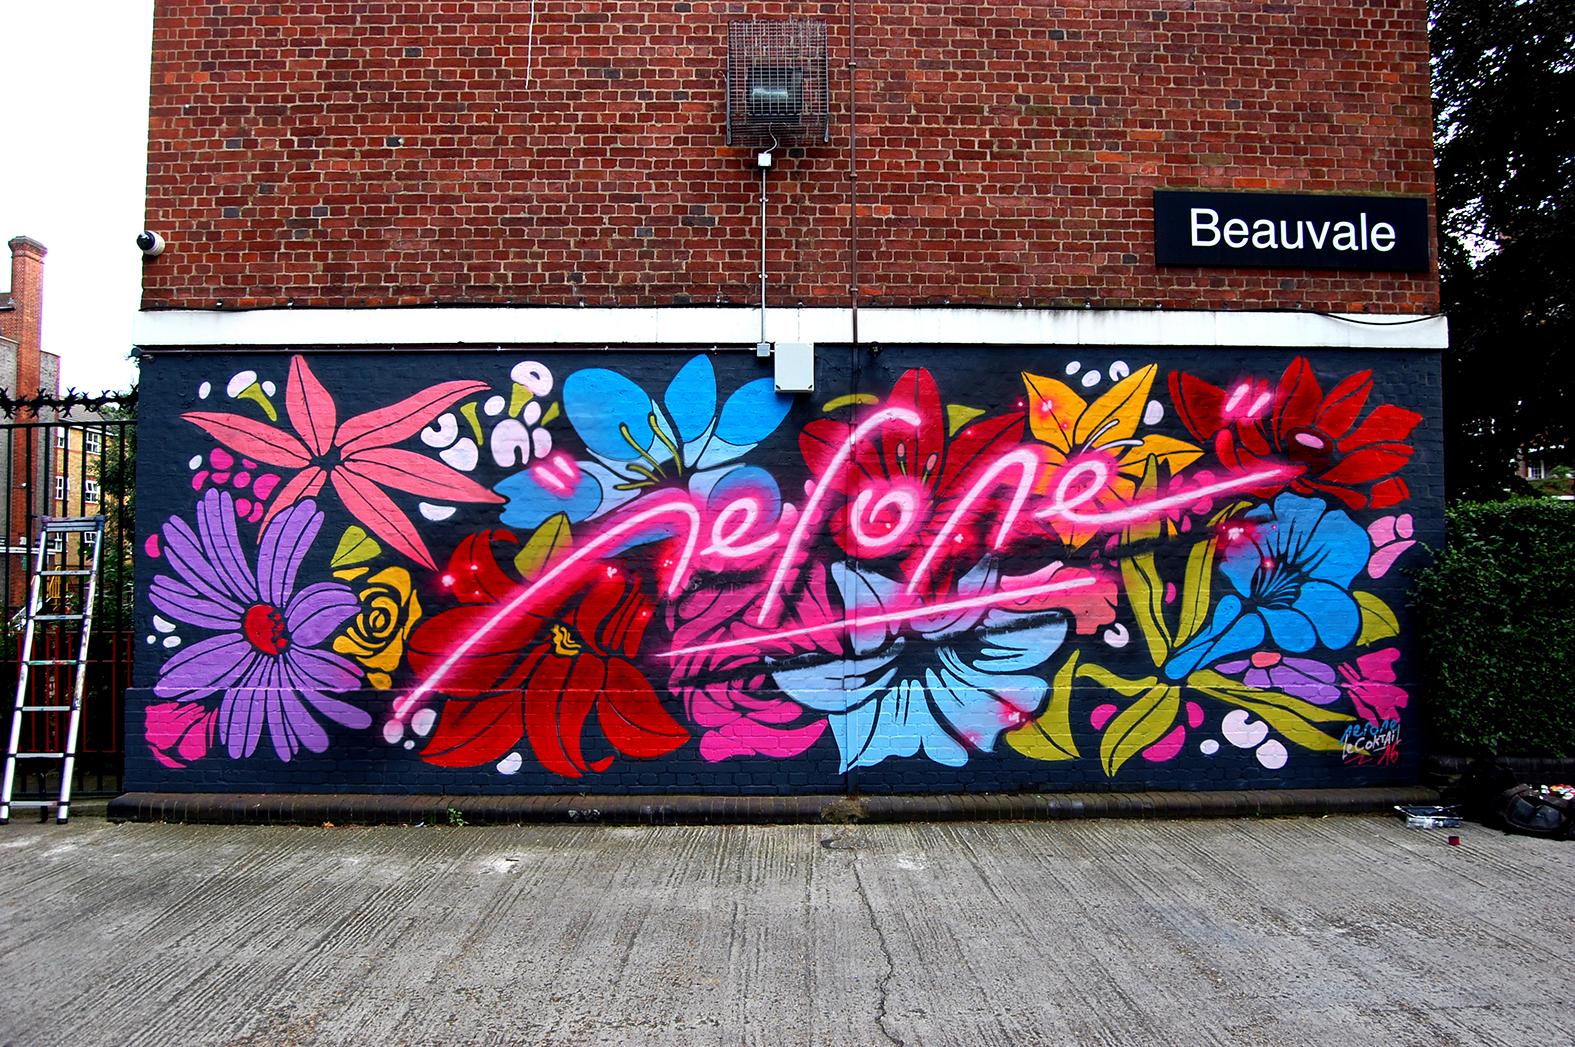 Nerone-graffiti-street-art-3